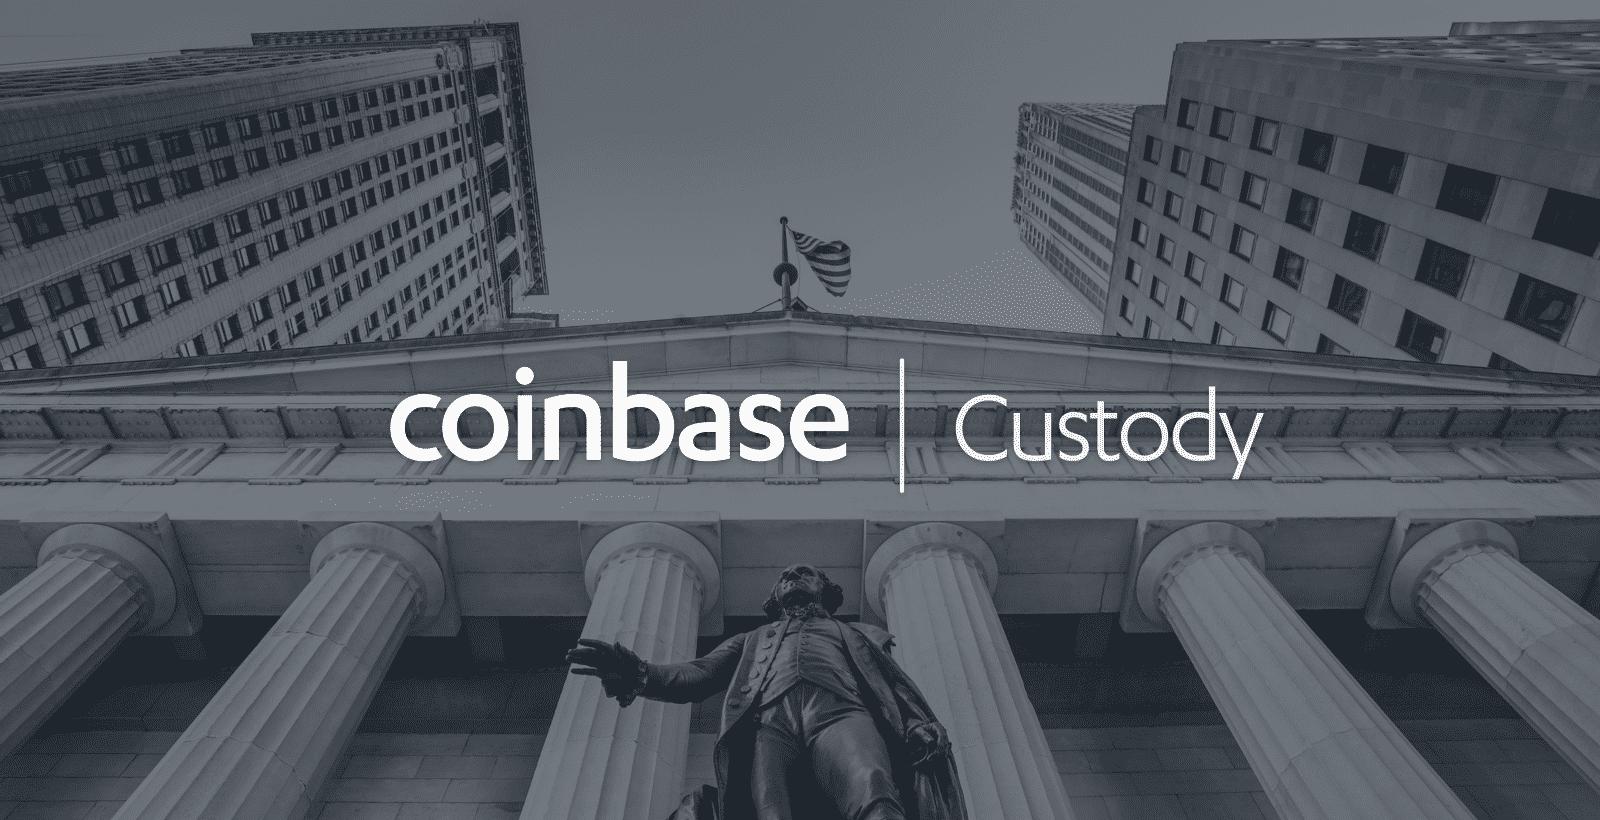 Coinbase-Custody كل ما نعرفه عن خدمة Coinbase Custody التي ستضاف إليها الريبل XRP